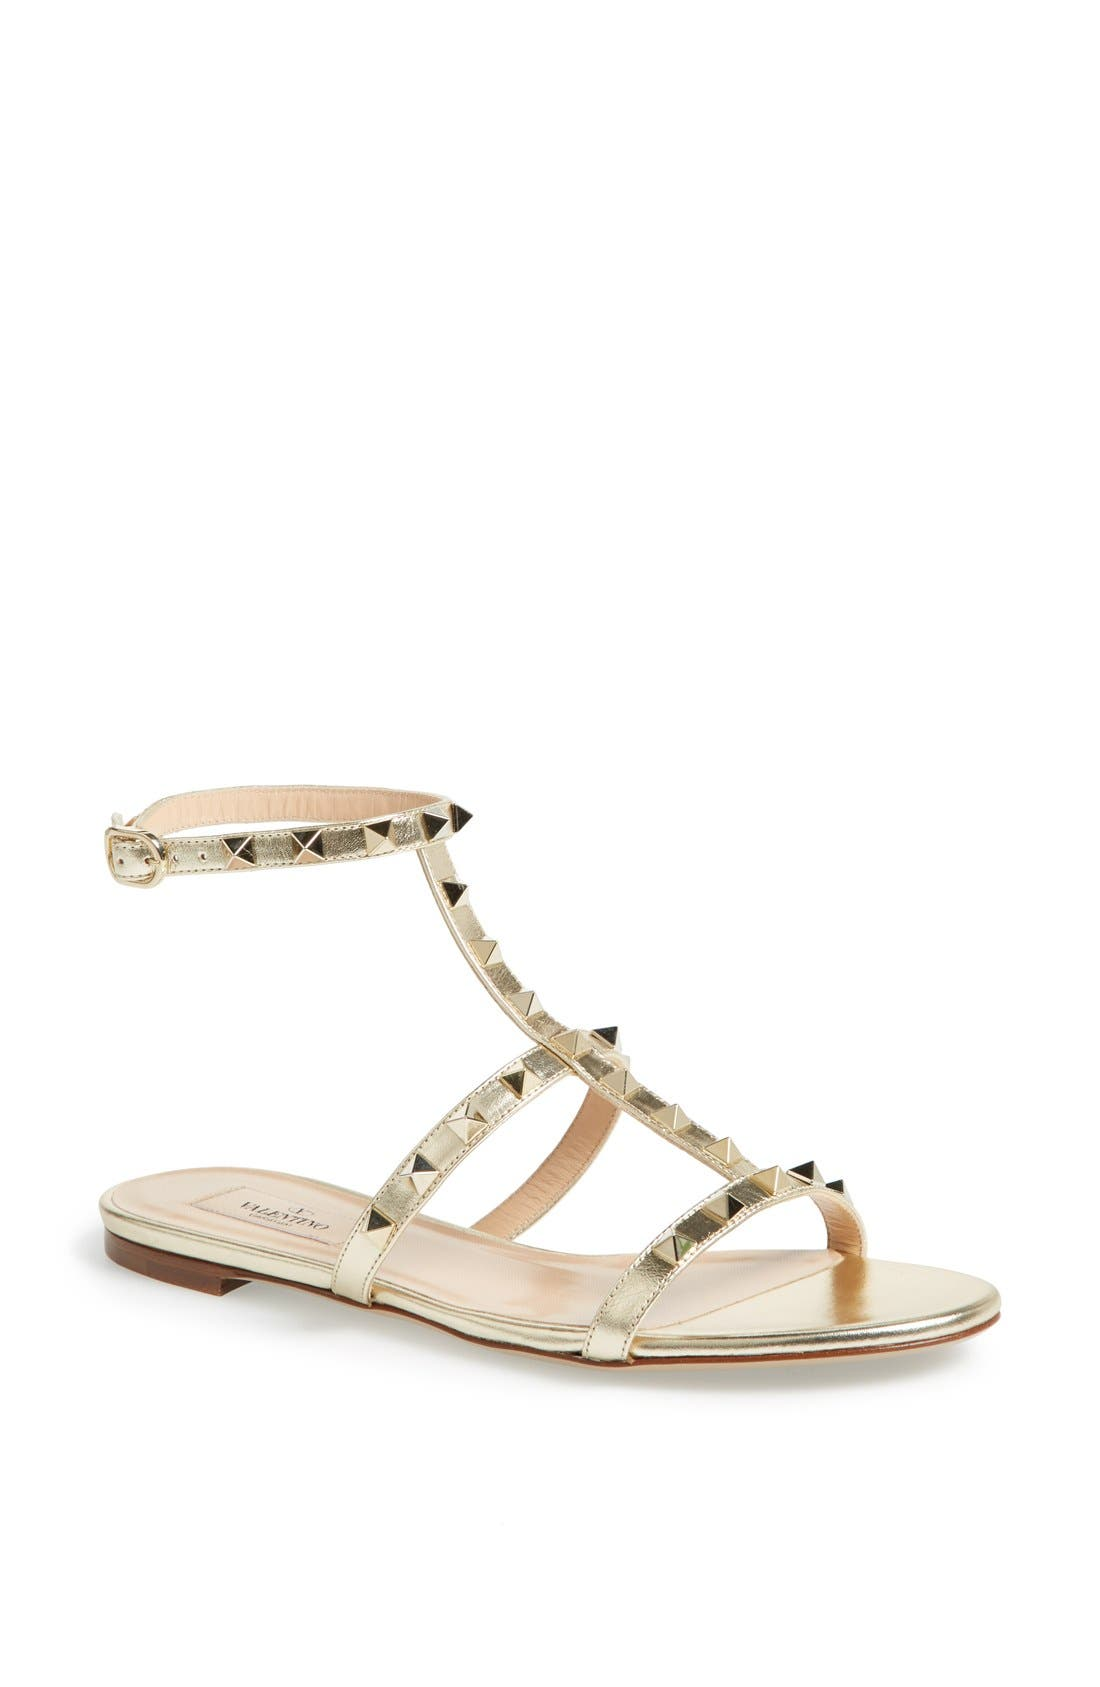 Main Image - Valentino 'Rockstud' T-Strap Sandal